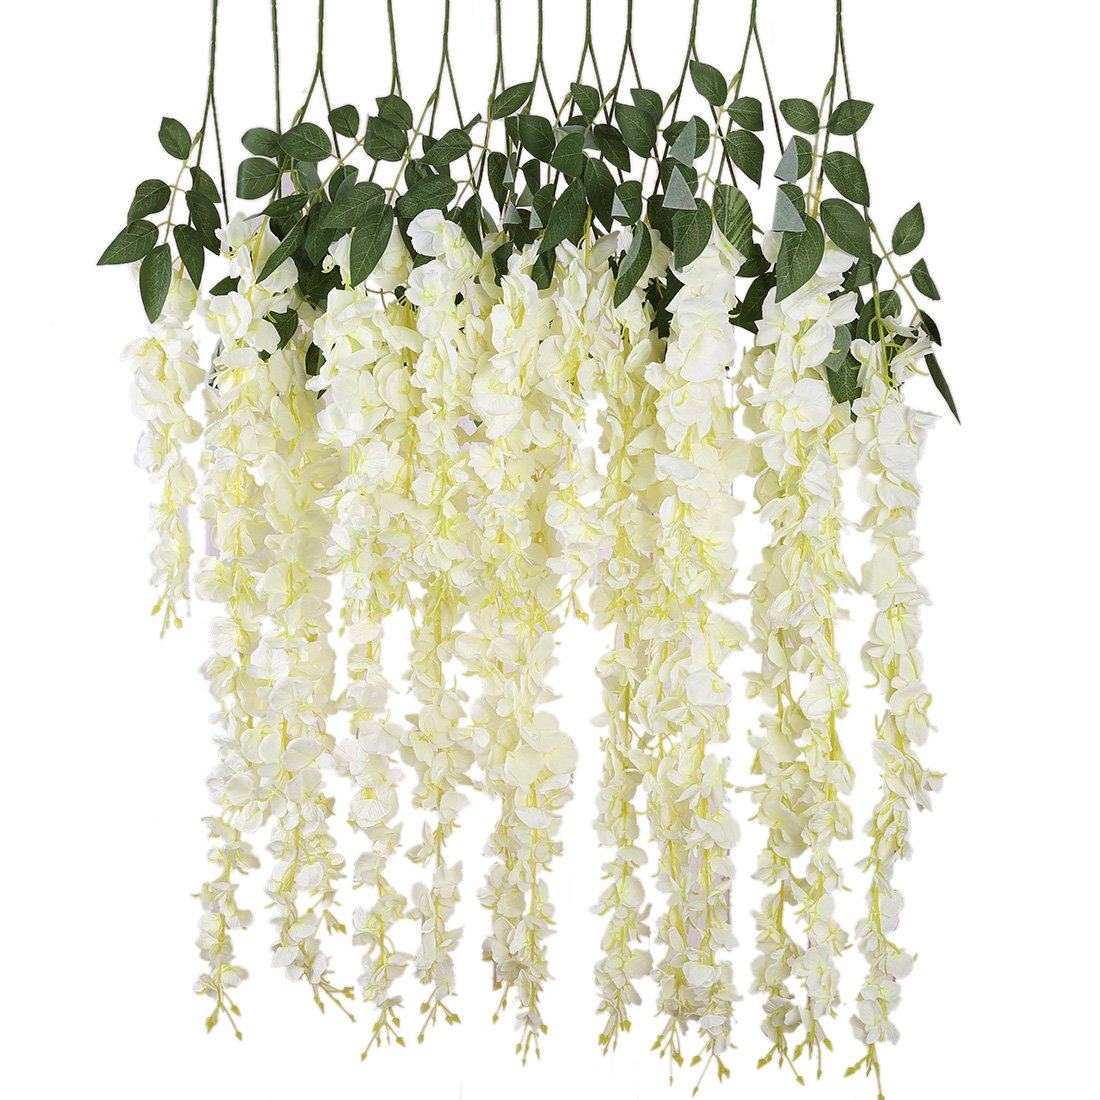 Shop amazon artificial flowers luyue 318 feet artificial silk wisteria vine ratta silk hanging flower wedding decor6 pieceswhite white dhlflorist Image collections